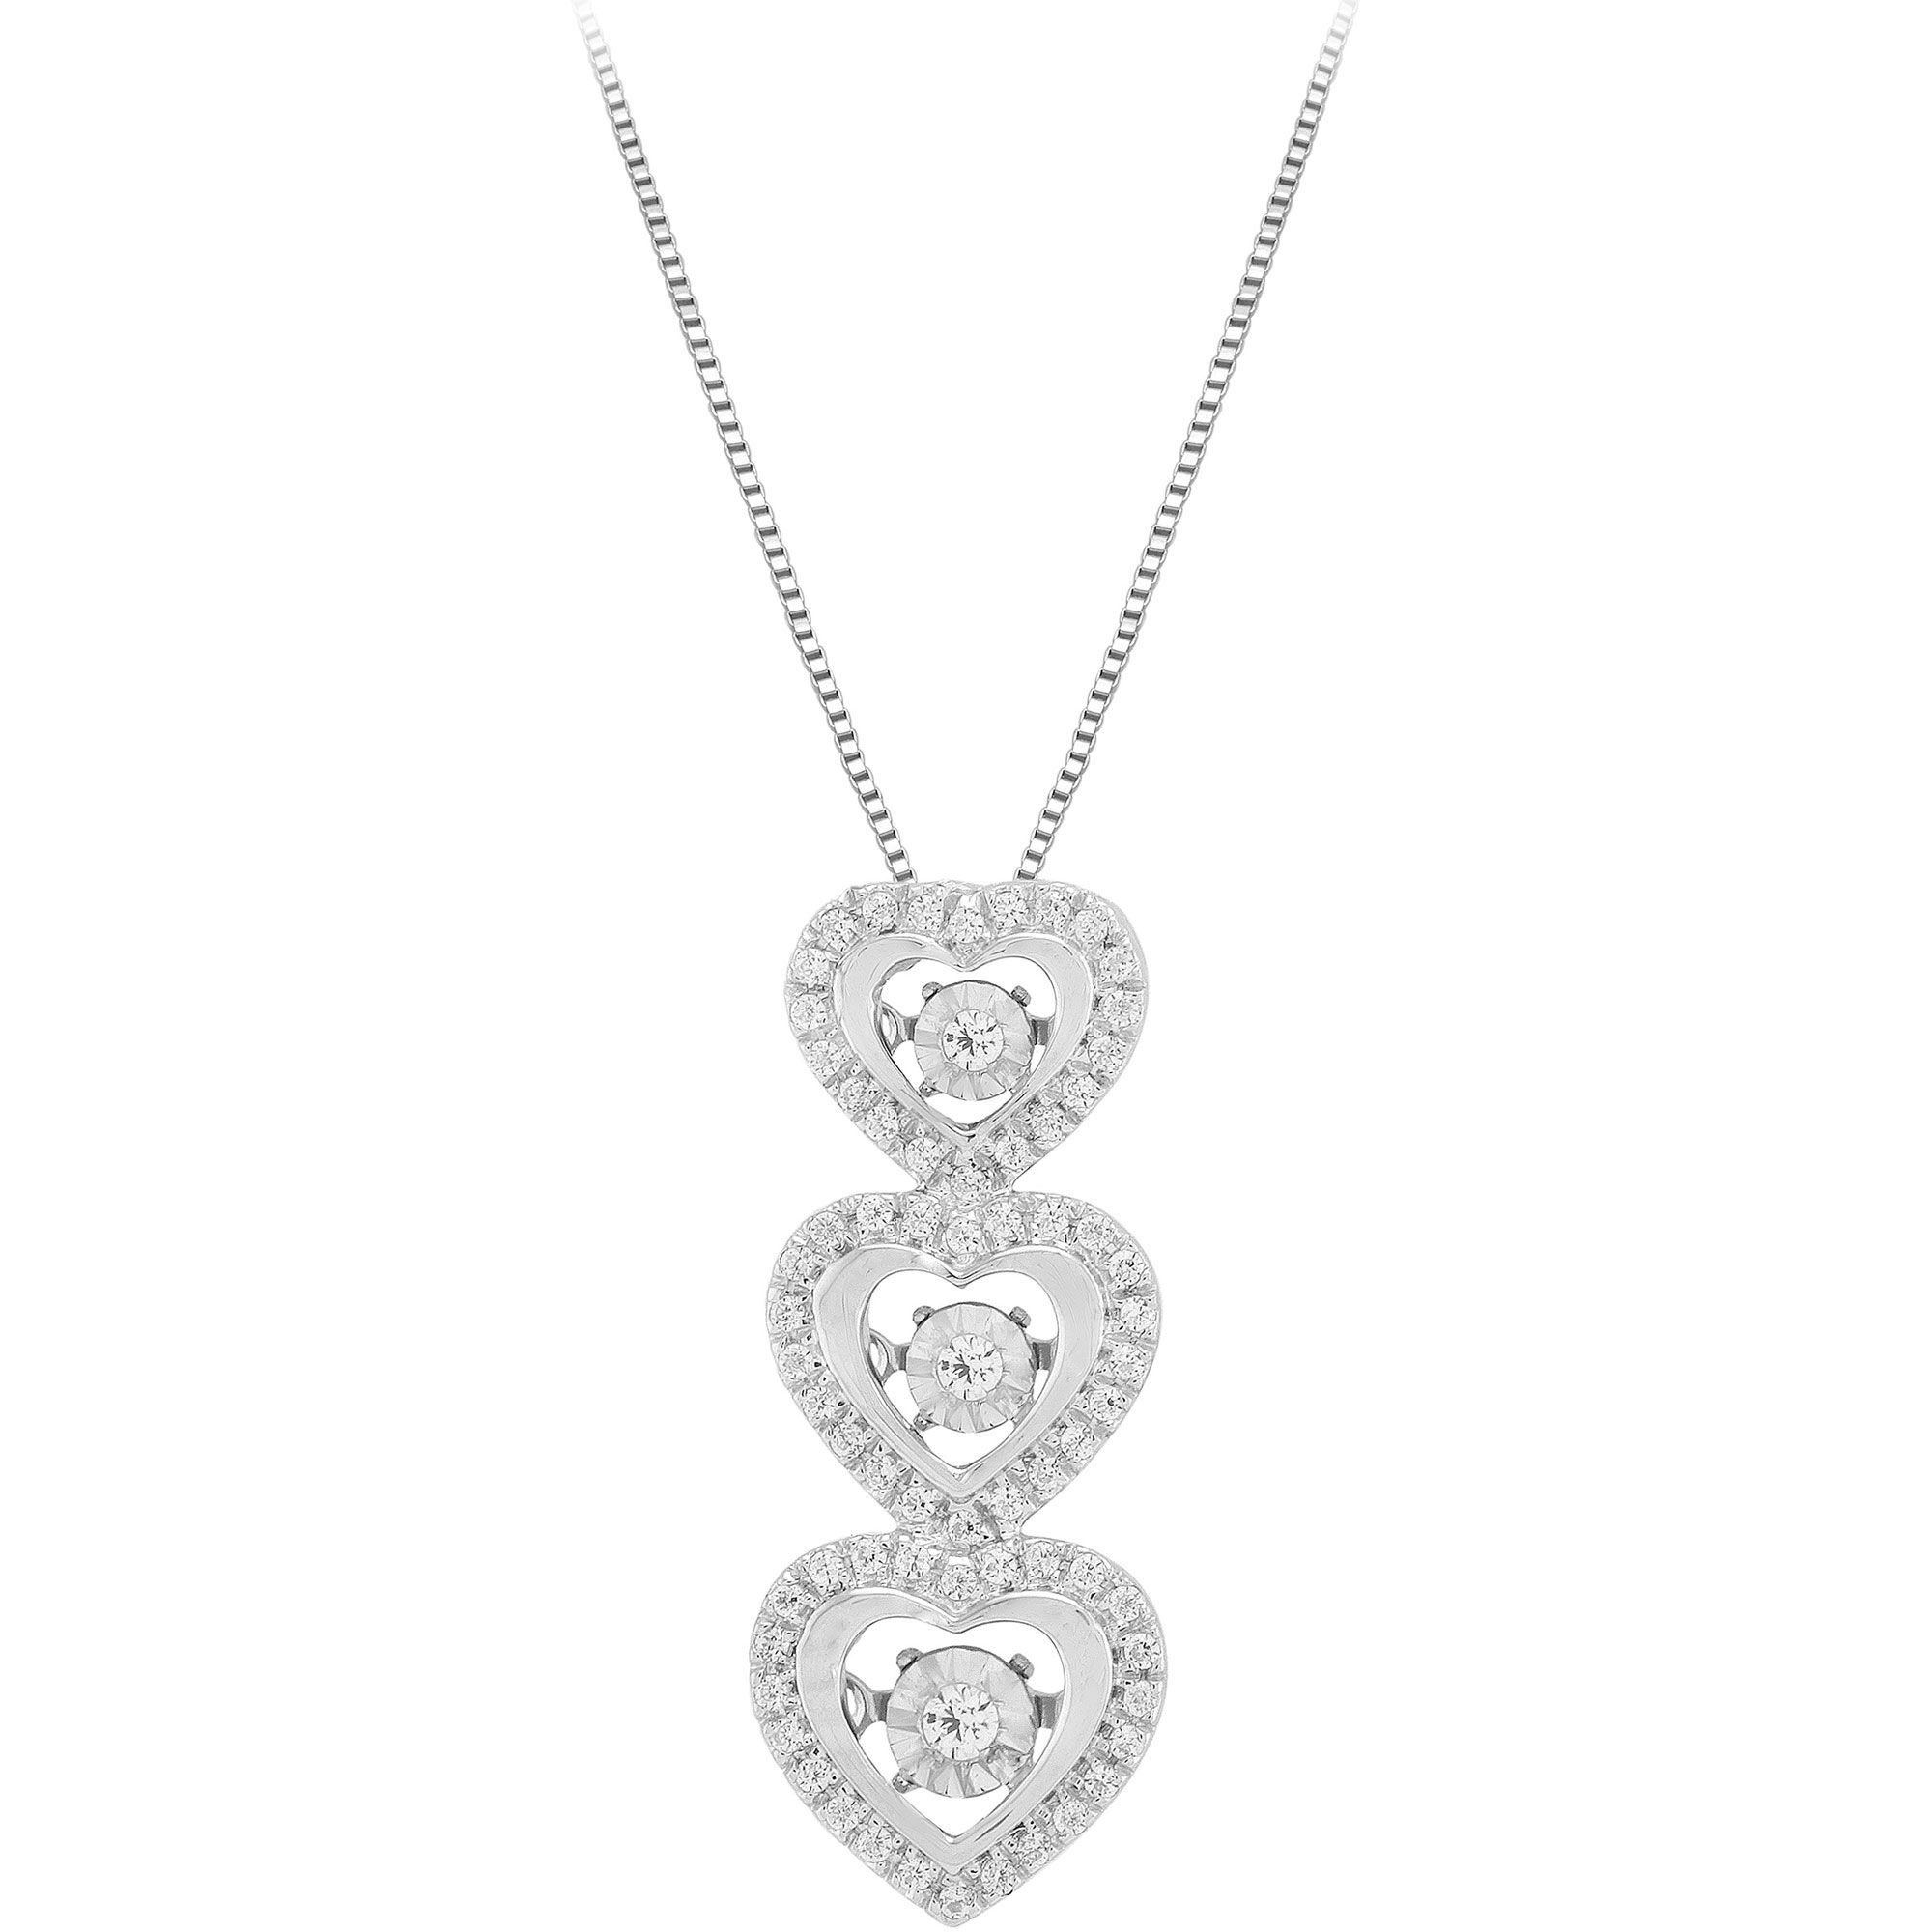 10K Yellow Gold I LOVE Heart Charm Pendant Necklace Black Cord Love VALENTINE